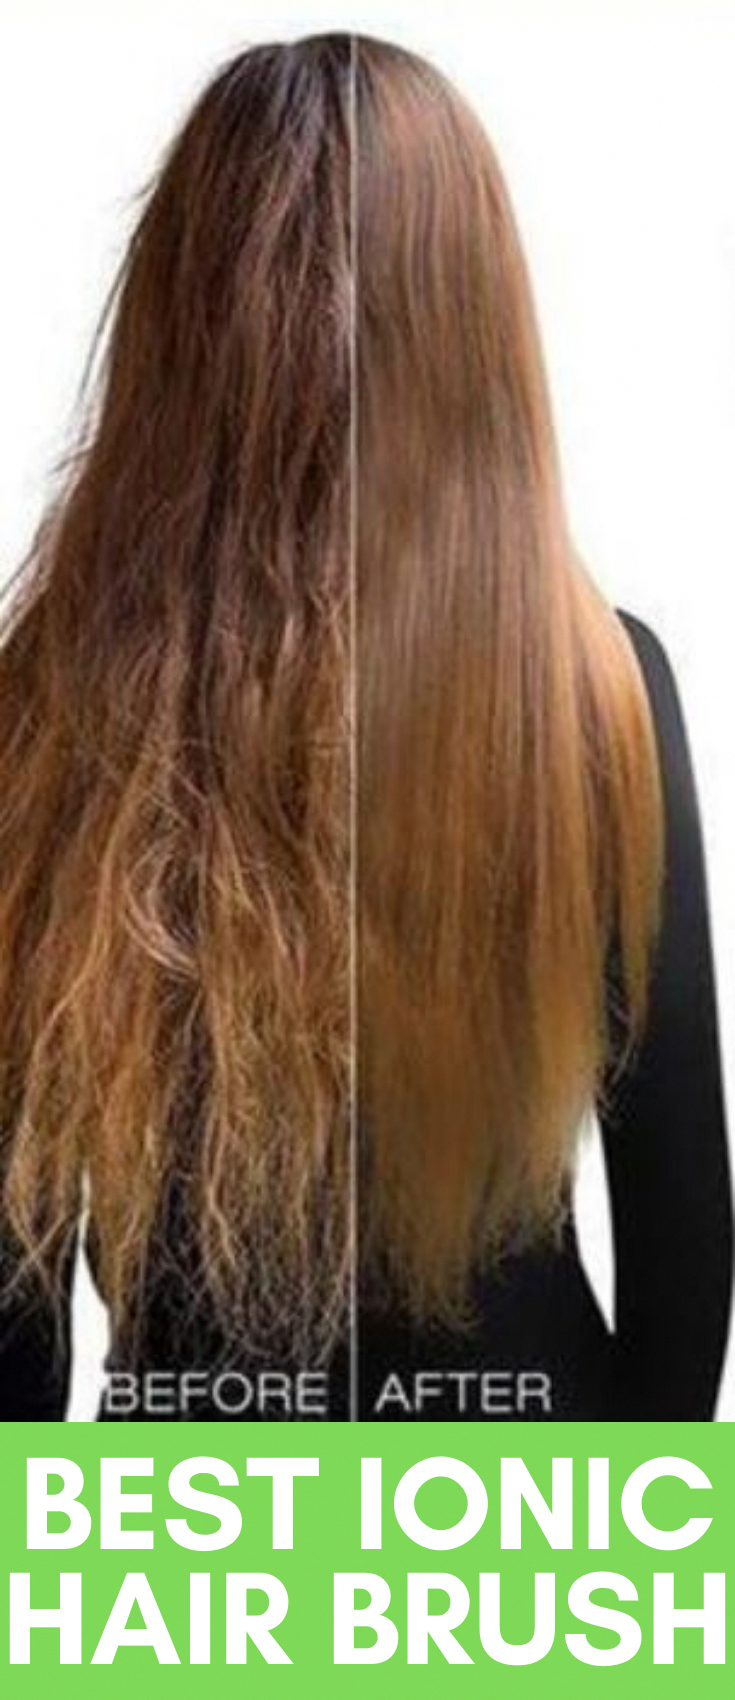 Best Ionic Hair Brush In 2020 Ionic Hair Brush Hair Brush How To Lighten Hair